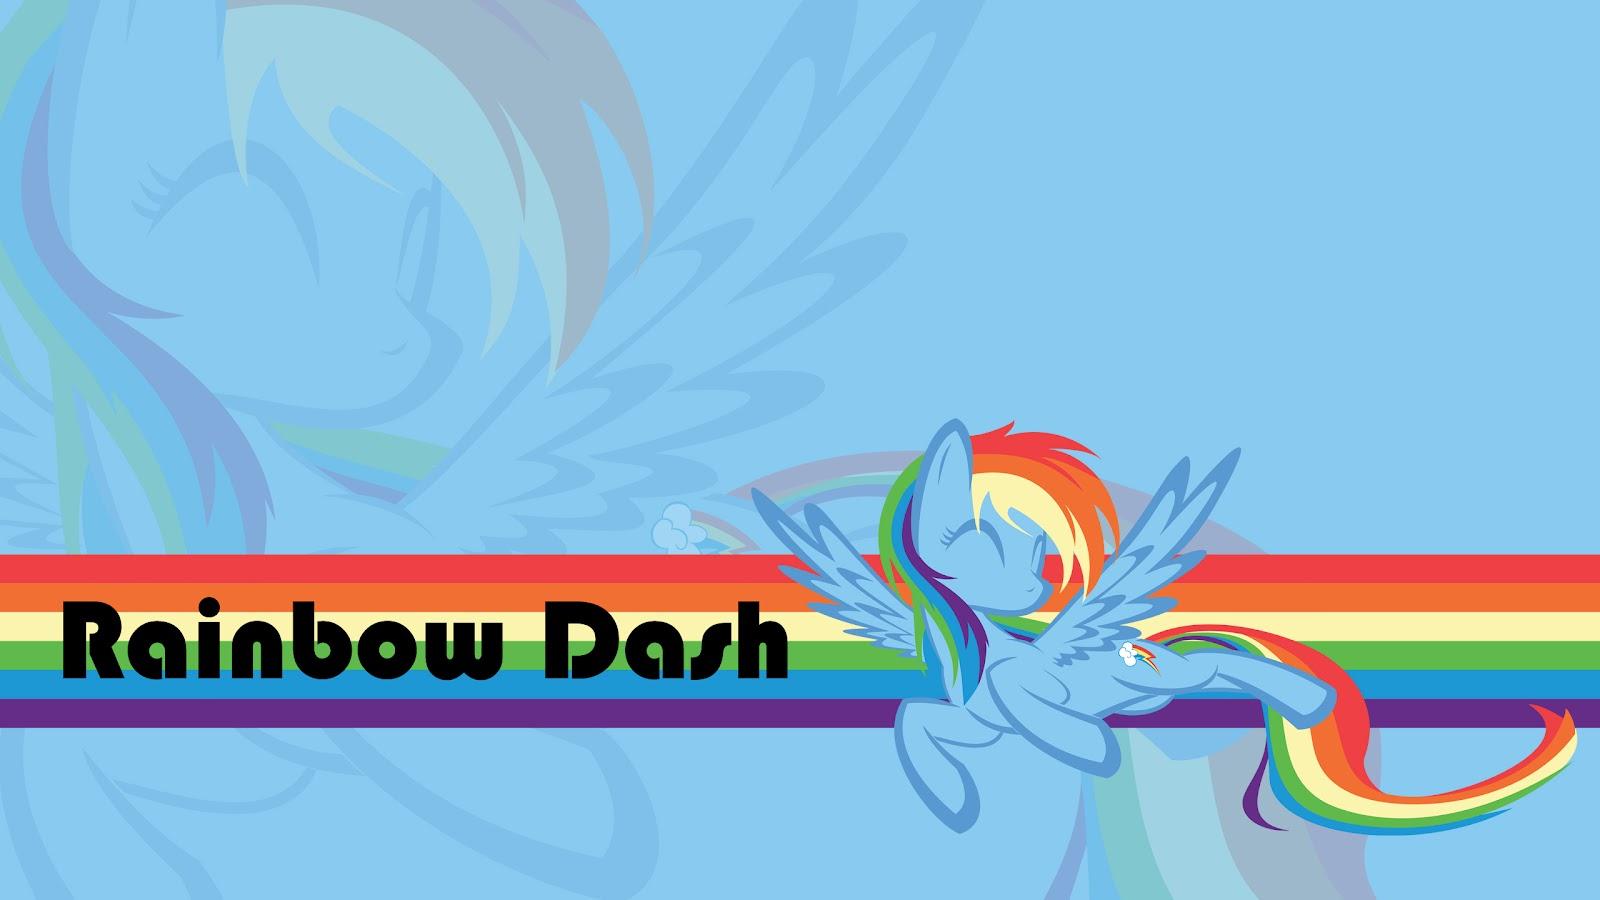 http://1.bp.blogspot.com/-2_YLexineFE/T5huMhD_oyI/AAAAAAAAAHo/FRvlYibcRJY/s1600/rainbow_dash_wallpaper_by_simmemann-d4w1ol6.jpg